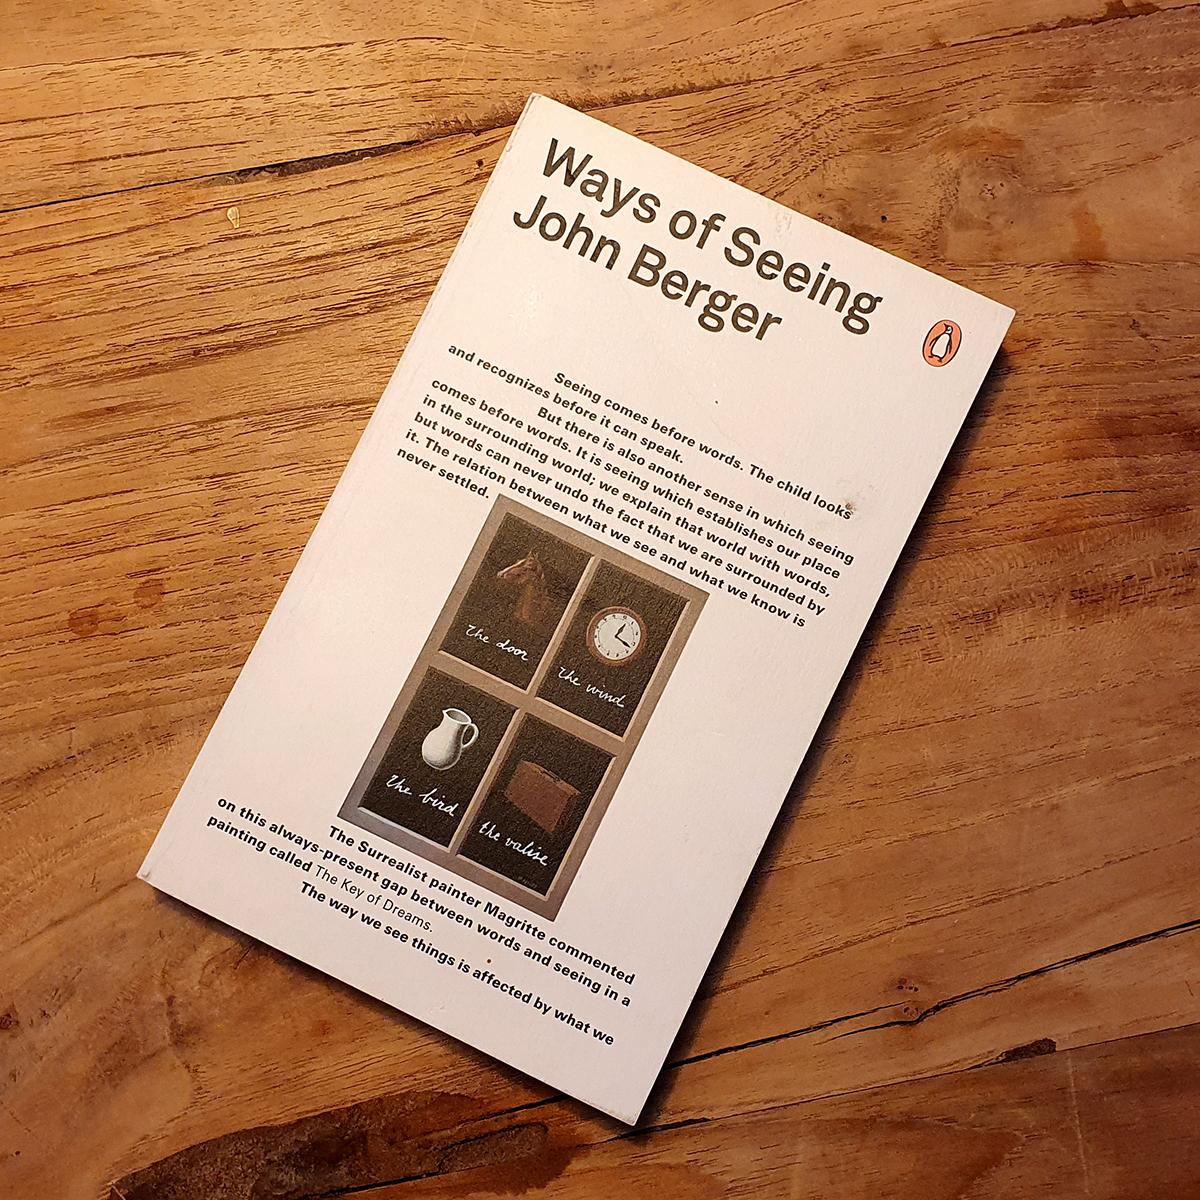 Boek Ways of Seeing - John Berger